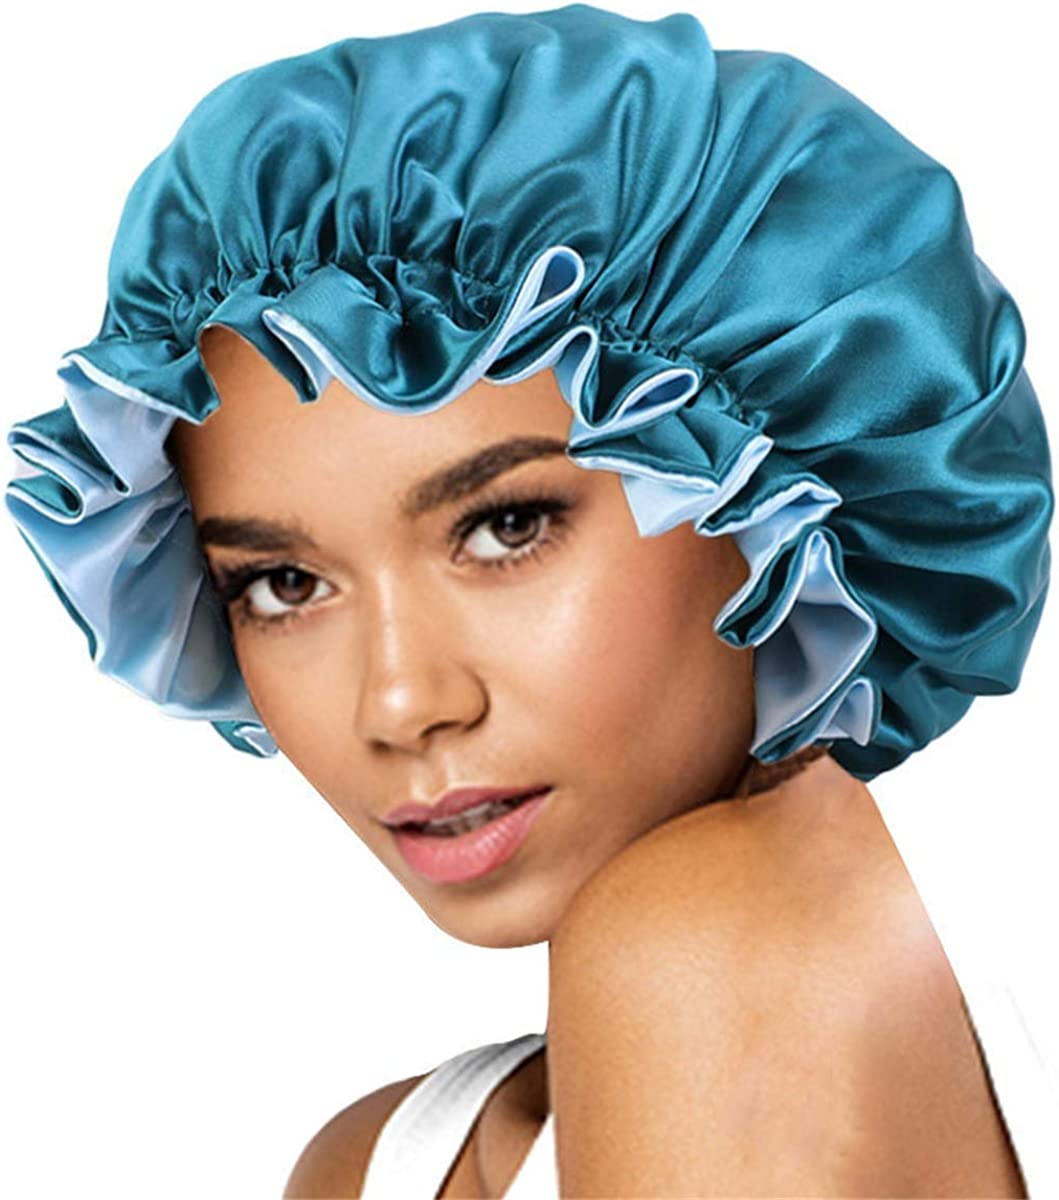 HZUX Double Side Sleep Cap Elastic Cap for Night Sleeping Hair Chemo Cap Hair Loss Head Scarf Wrap